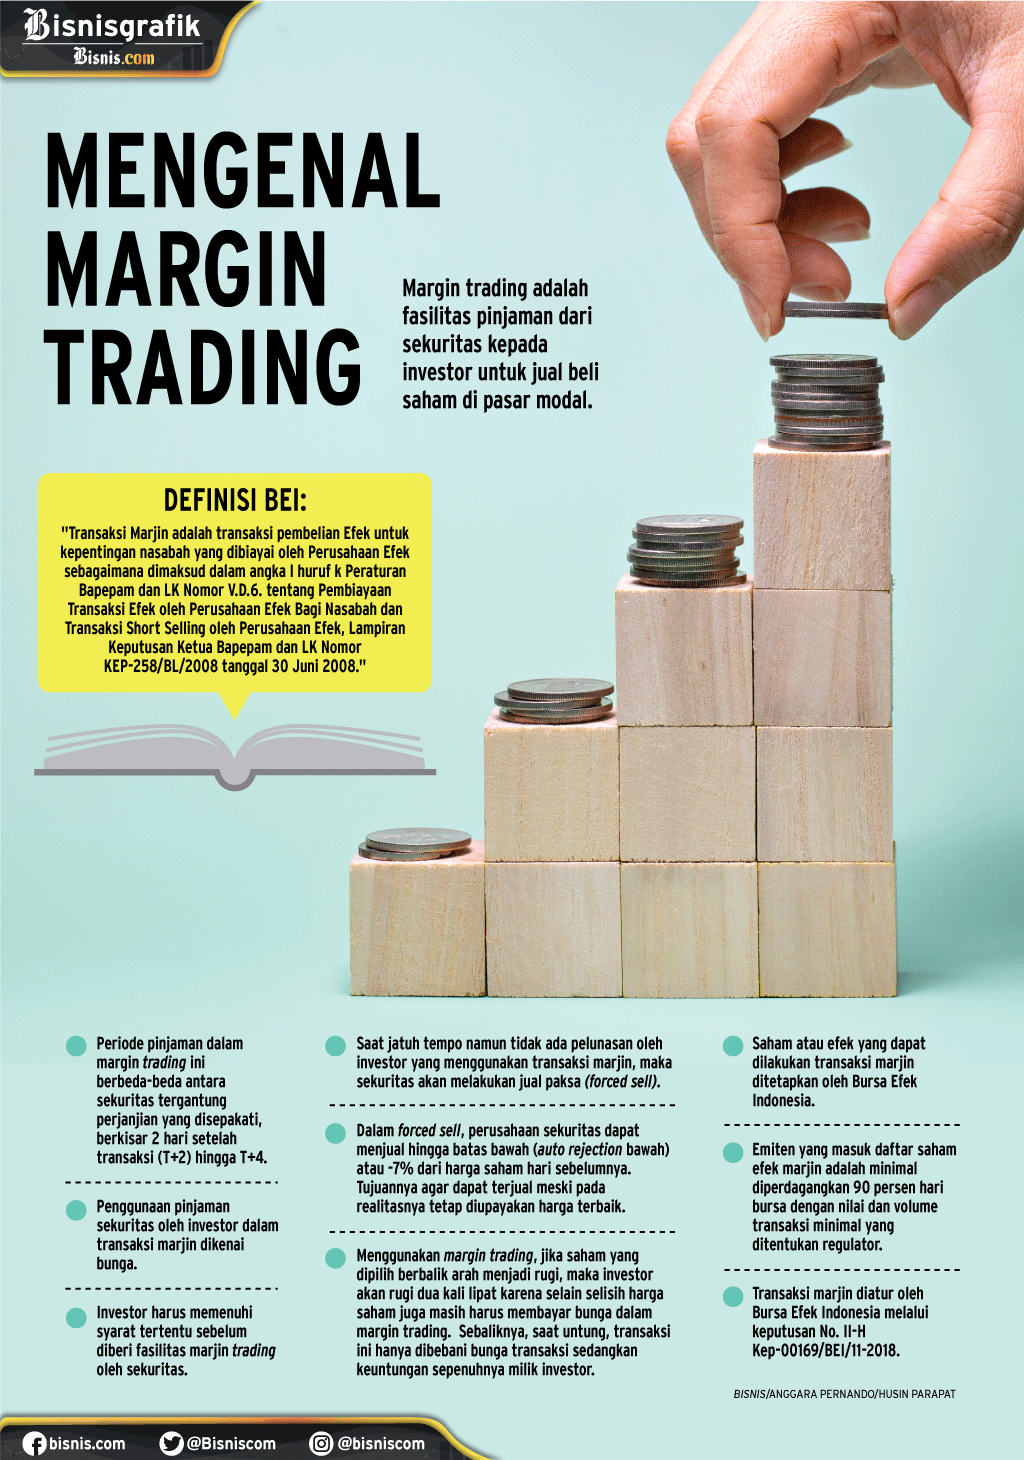 Margin trading./Bisnis-Husin Parapat - Anggara